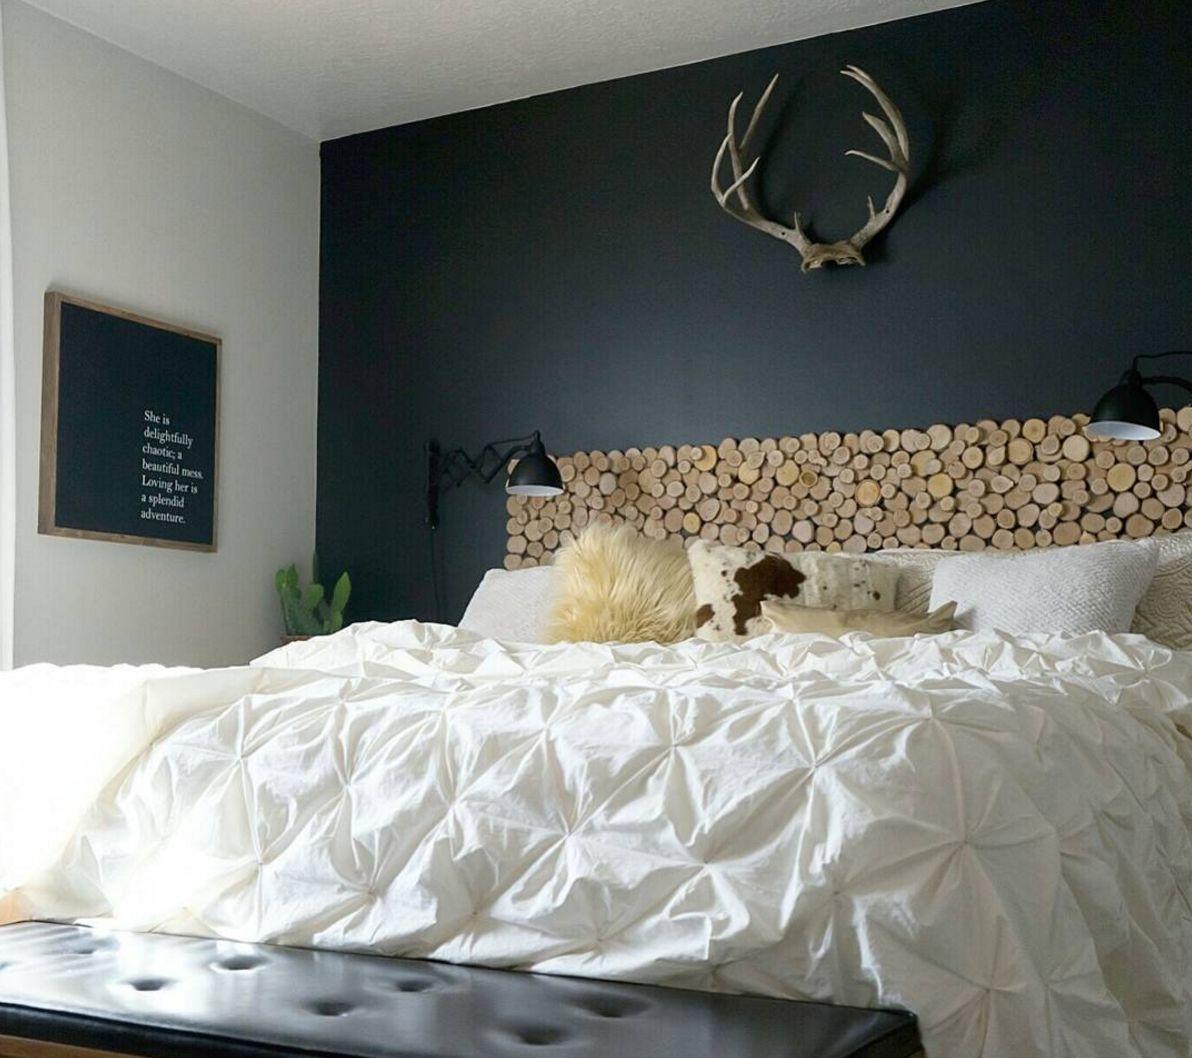 25 Stylish Headboard Alternatives That Will Transform Your Bedroom